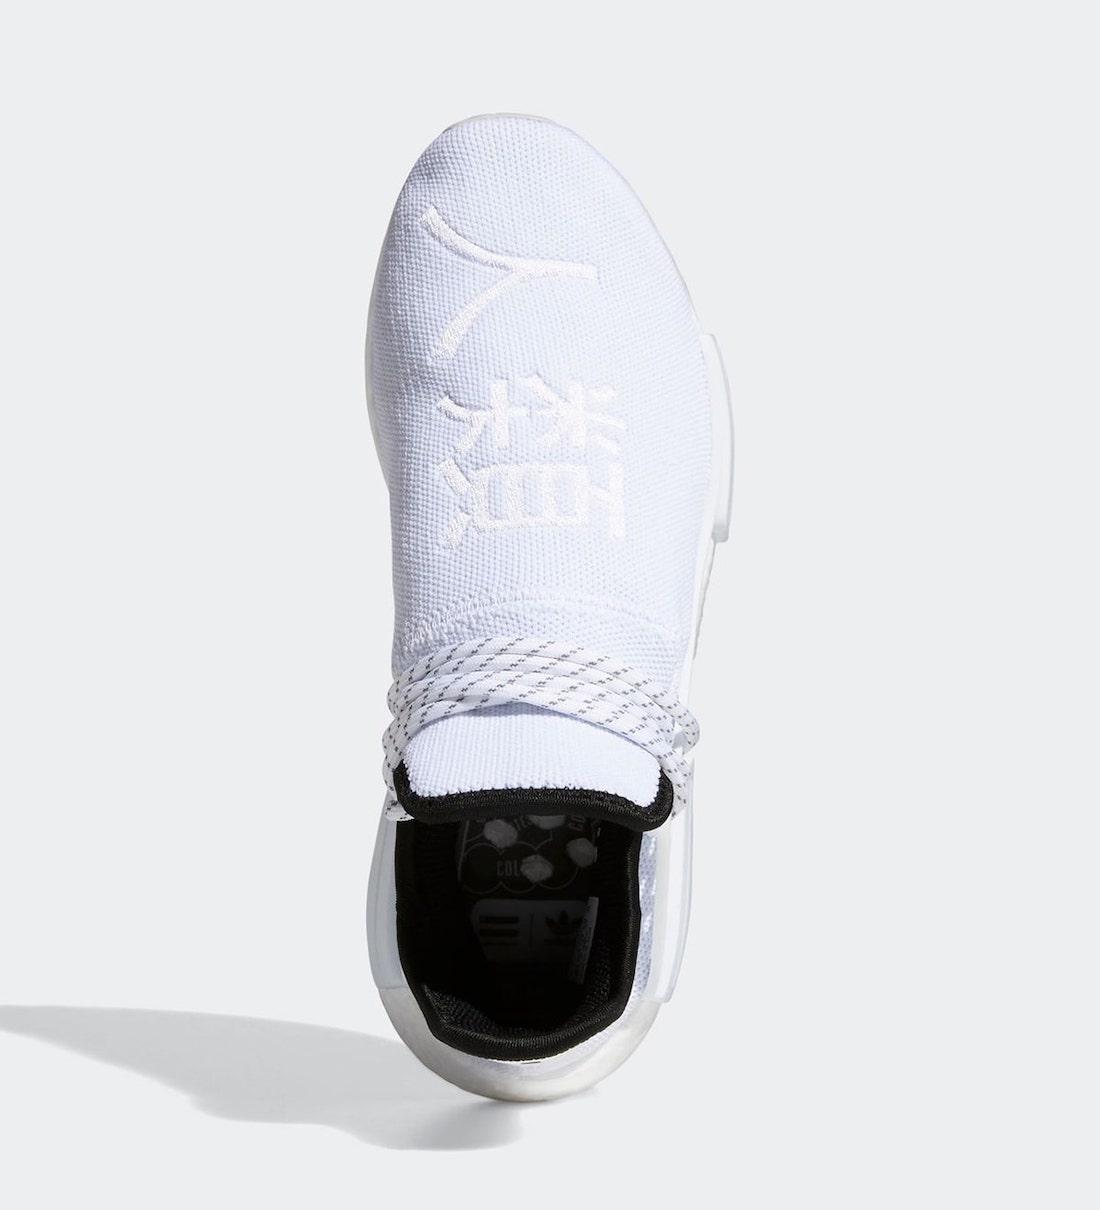 Pánské bílé tenisky a boty Pharrell x adidas NMD Hu White/Black/White GY0092 nízké sportovní botasky a obuv adidas